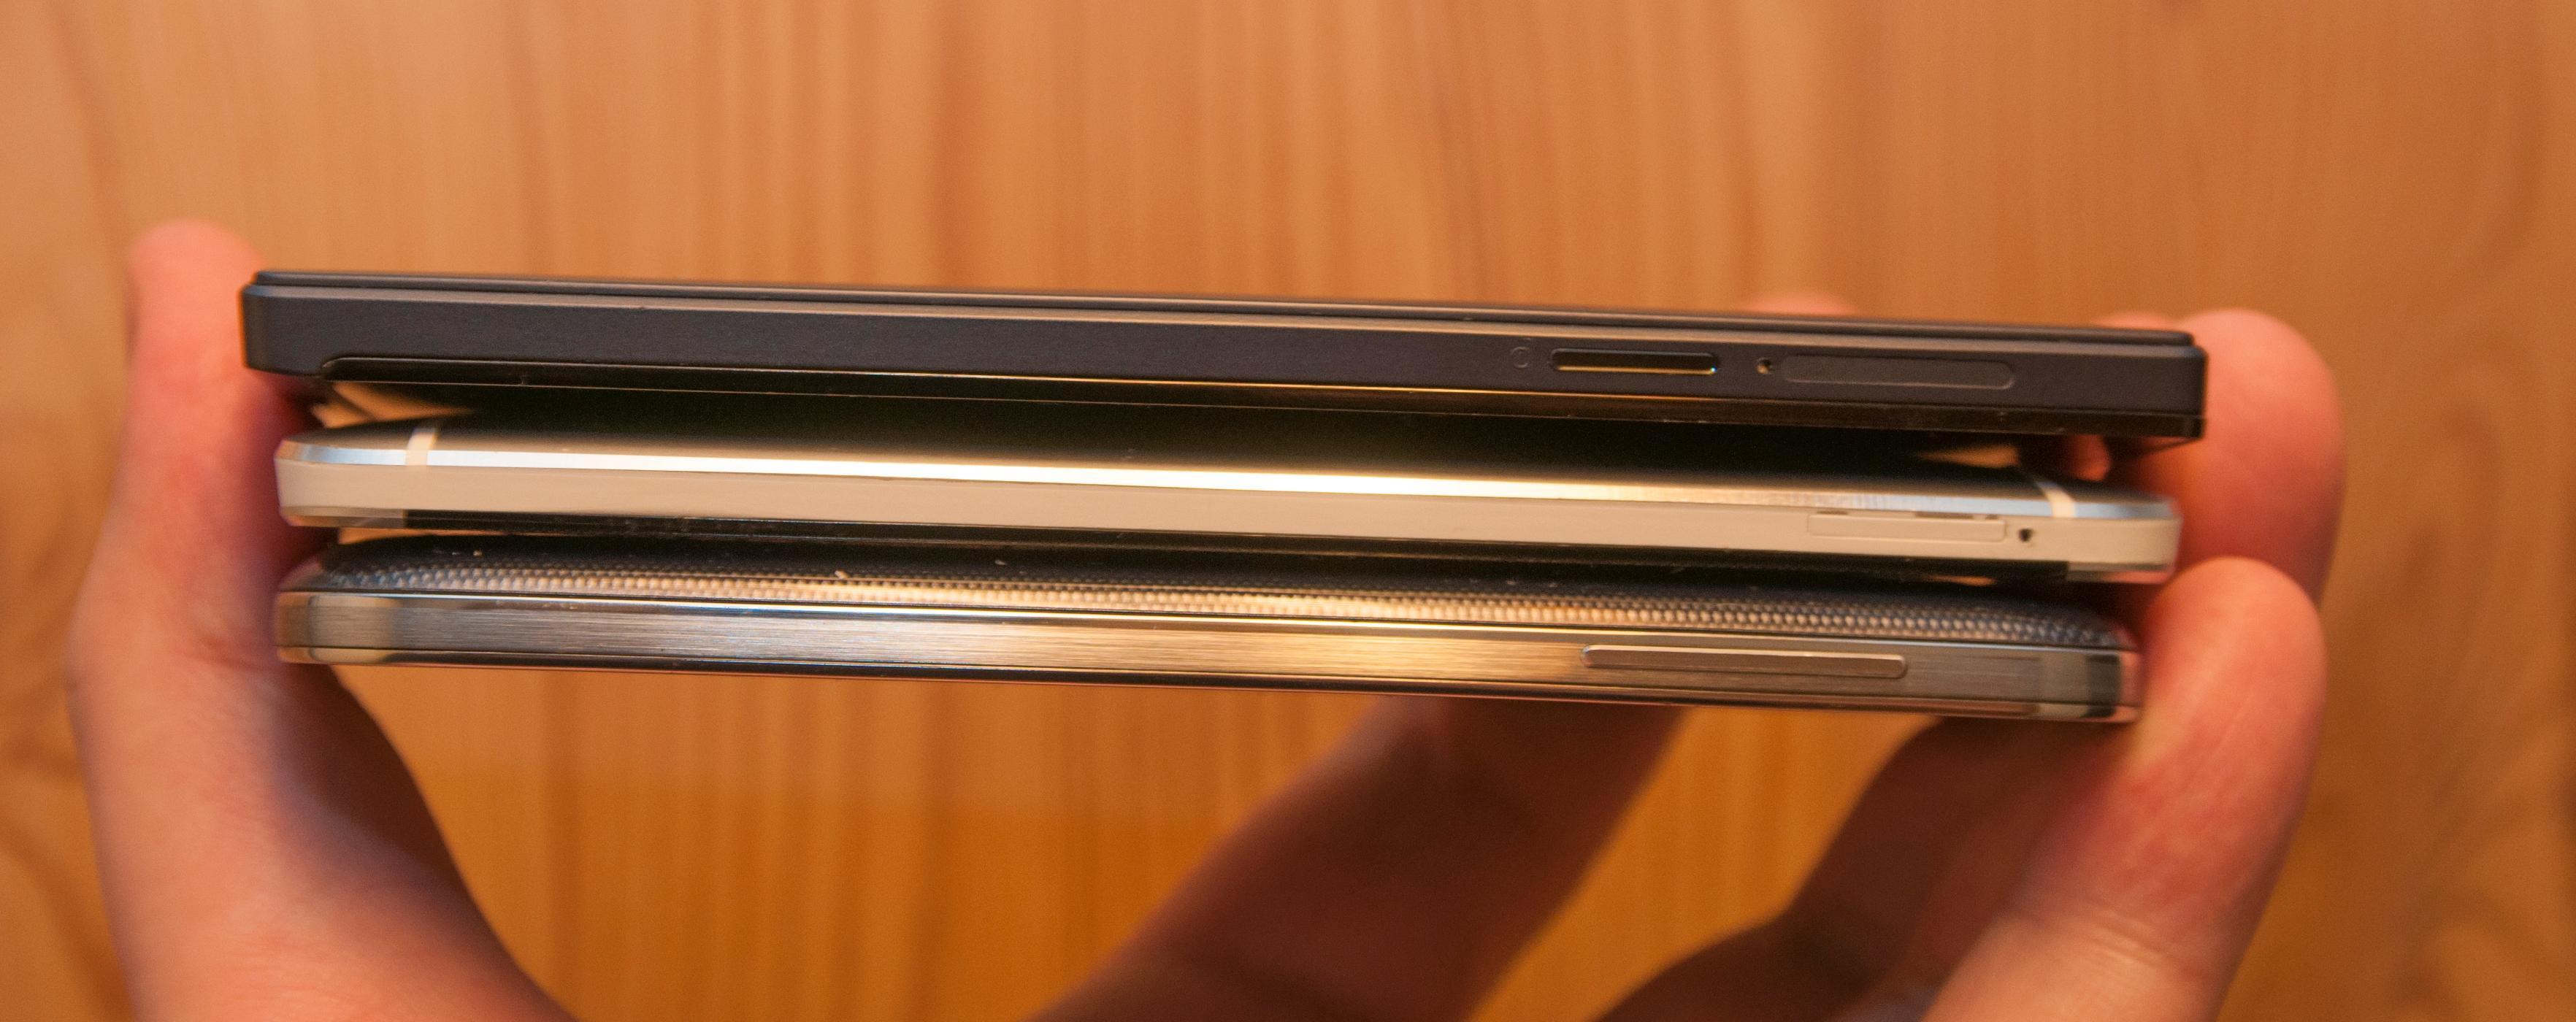 Smart sandwich. Fra toppen: Oppo Find 5, HTC One og Samsung Galaxy S4.Foto: Finn Jarle Kvalheim, Amobil.no